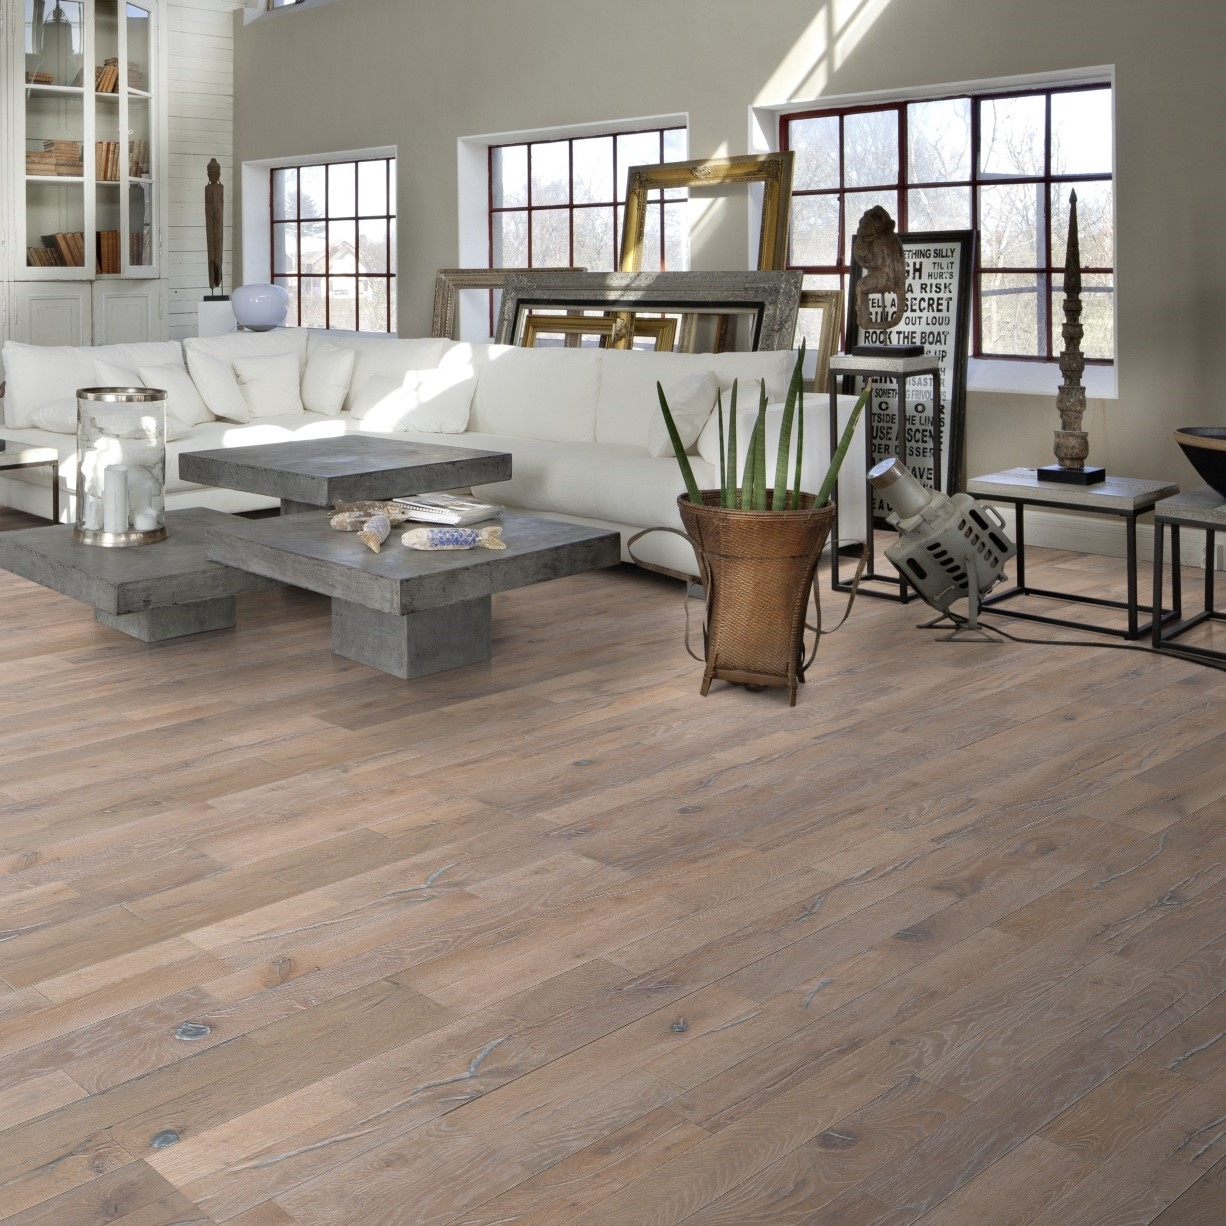 Kahrs Stockholm Expressive White 2-Strip Engineered Wood Flooring